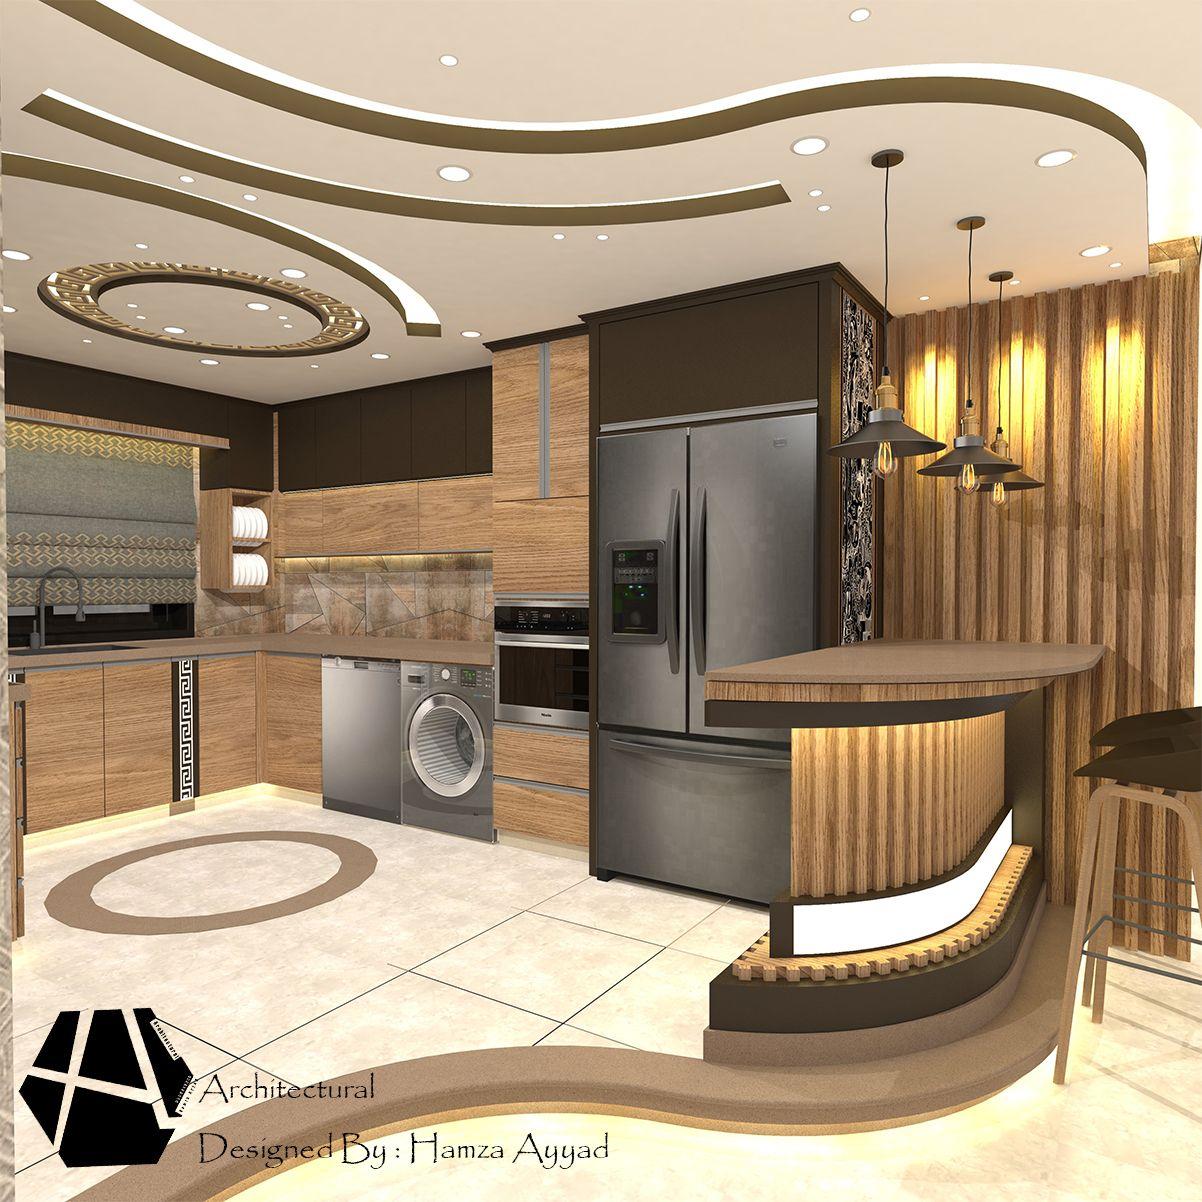 Kitchen Design Kitchen Idea Kitchen Counter Top Counter Top Design Kitchen Counter Decor مطابخ ح Diy Countertops Trendy Bathroom Tiles Wood Countertops